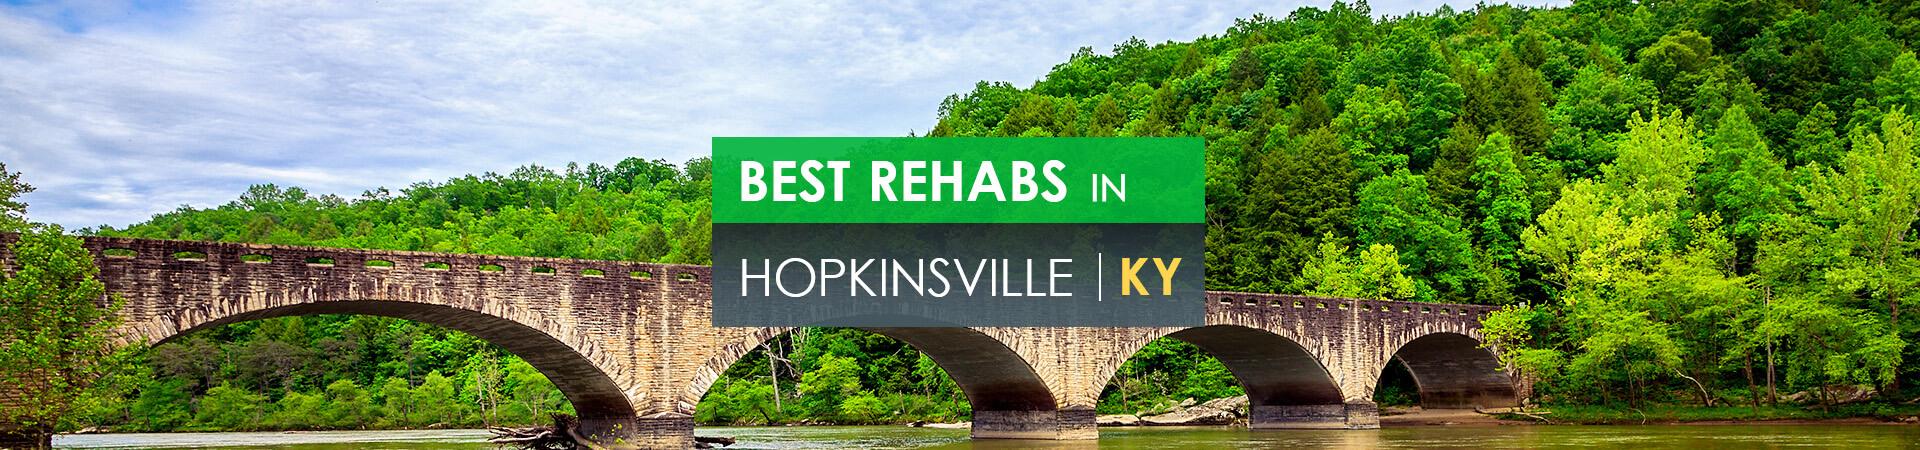 Best rehabs in Hopkinsville, KY